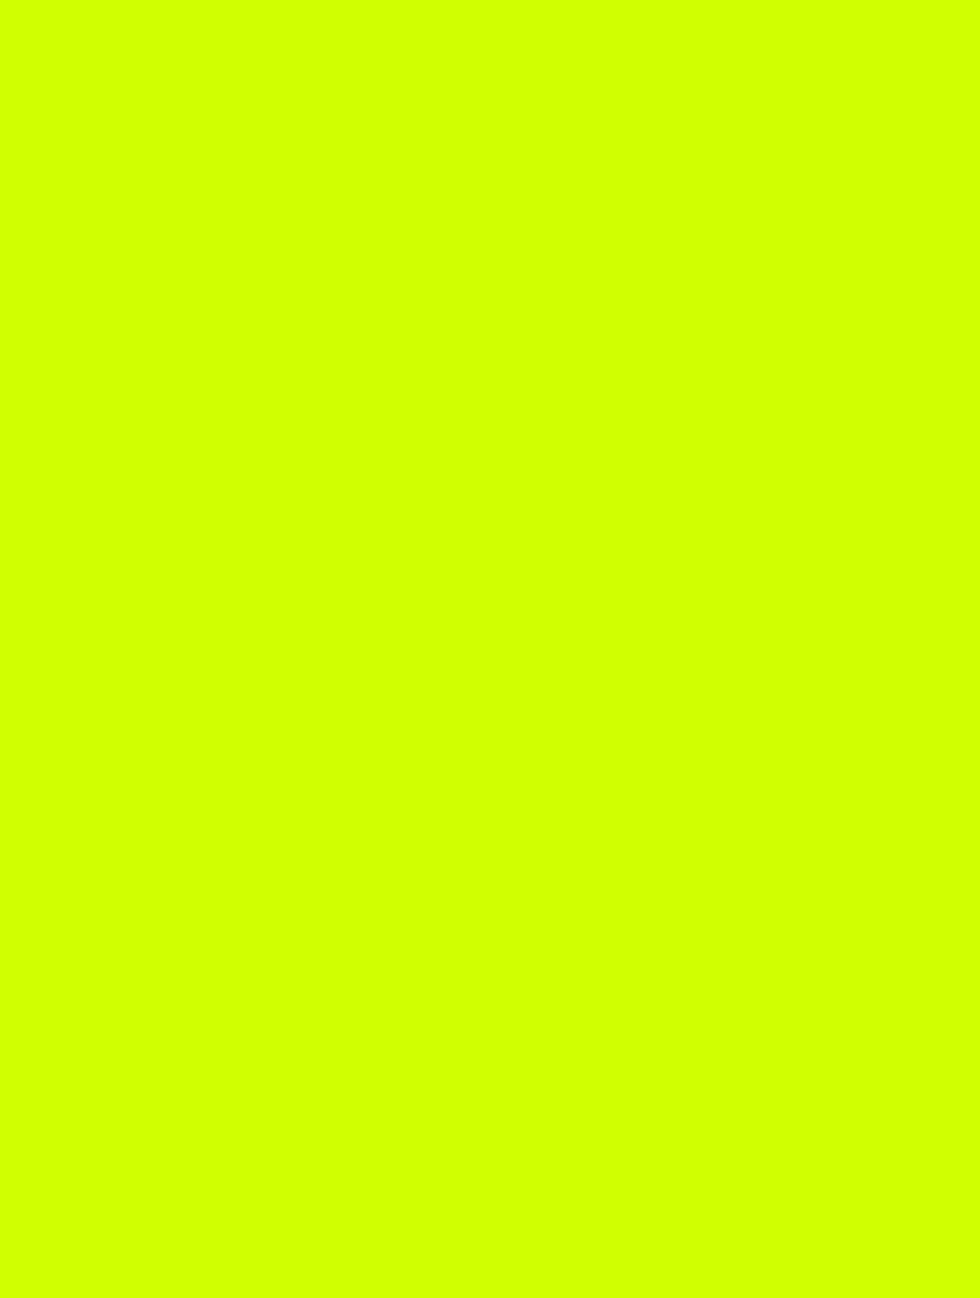 grunneon.jpg